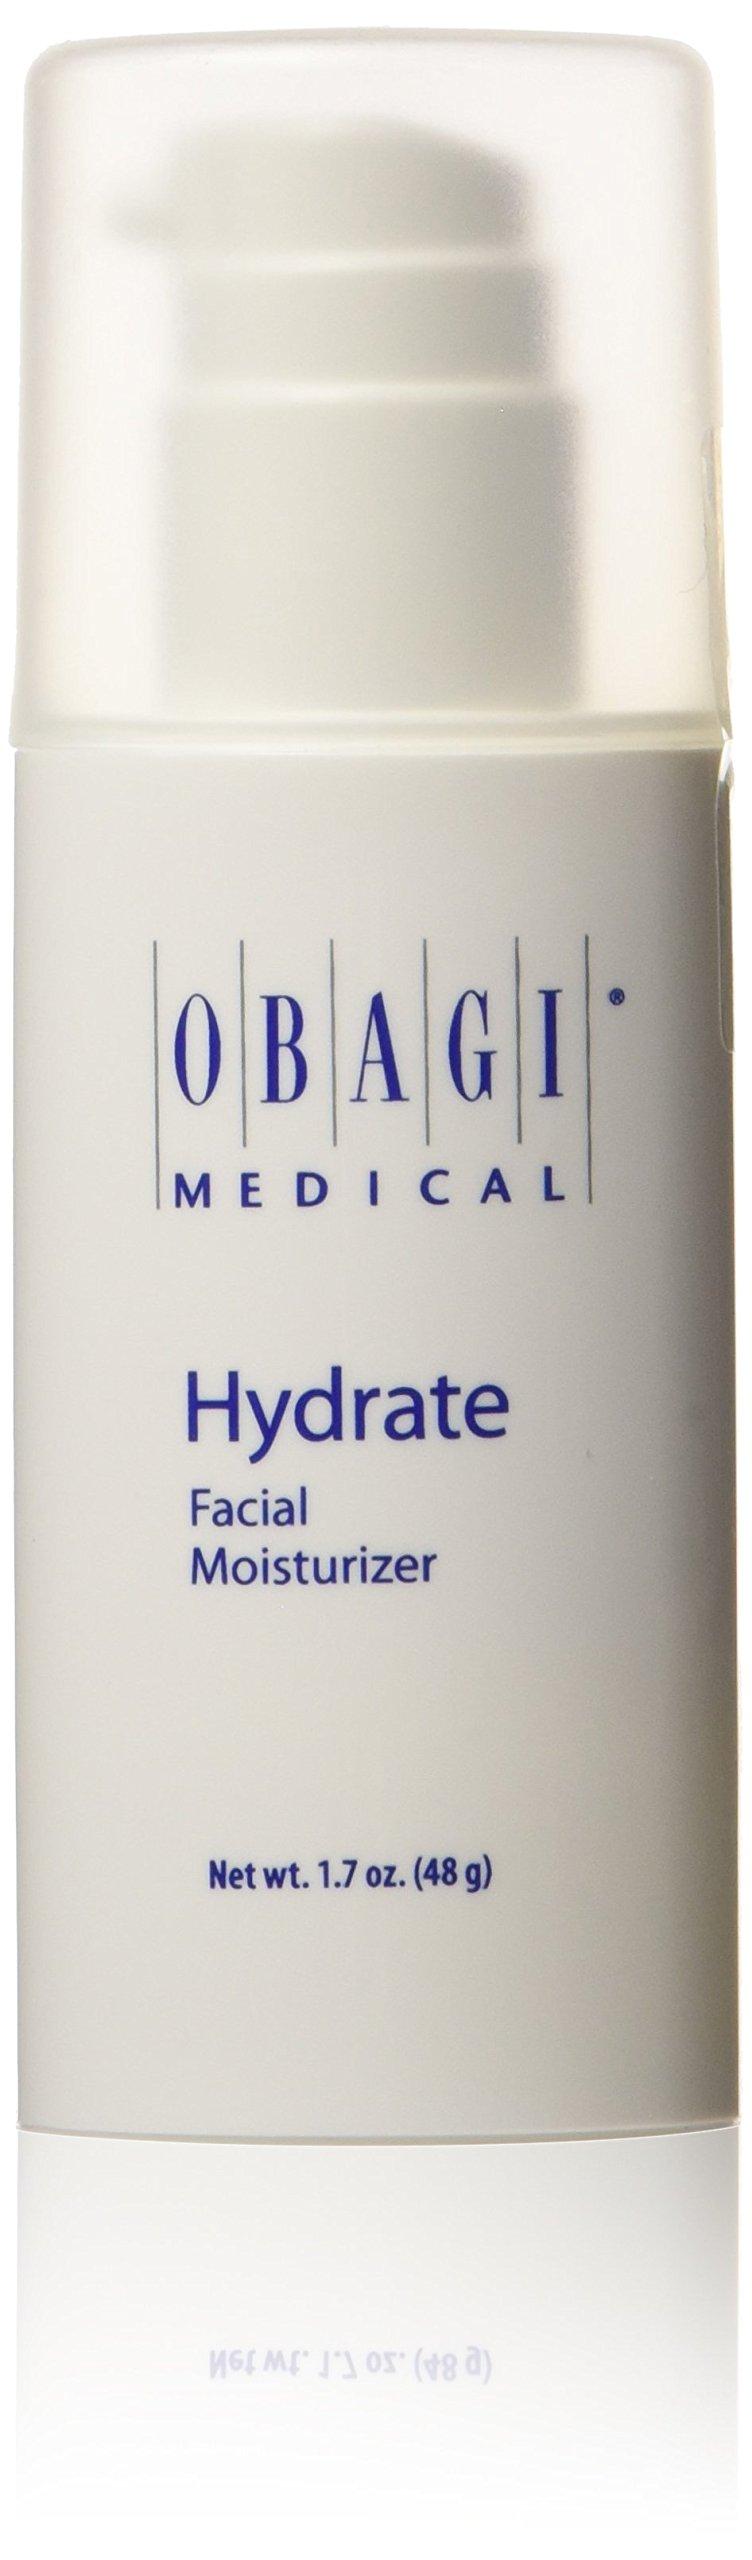 Obagi Hydrate Facial Moisturizer, 1.7 oz by Obagi Medical